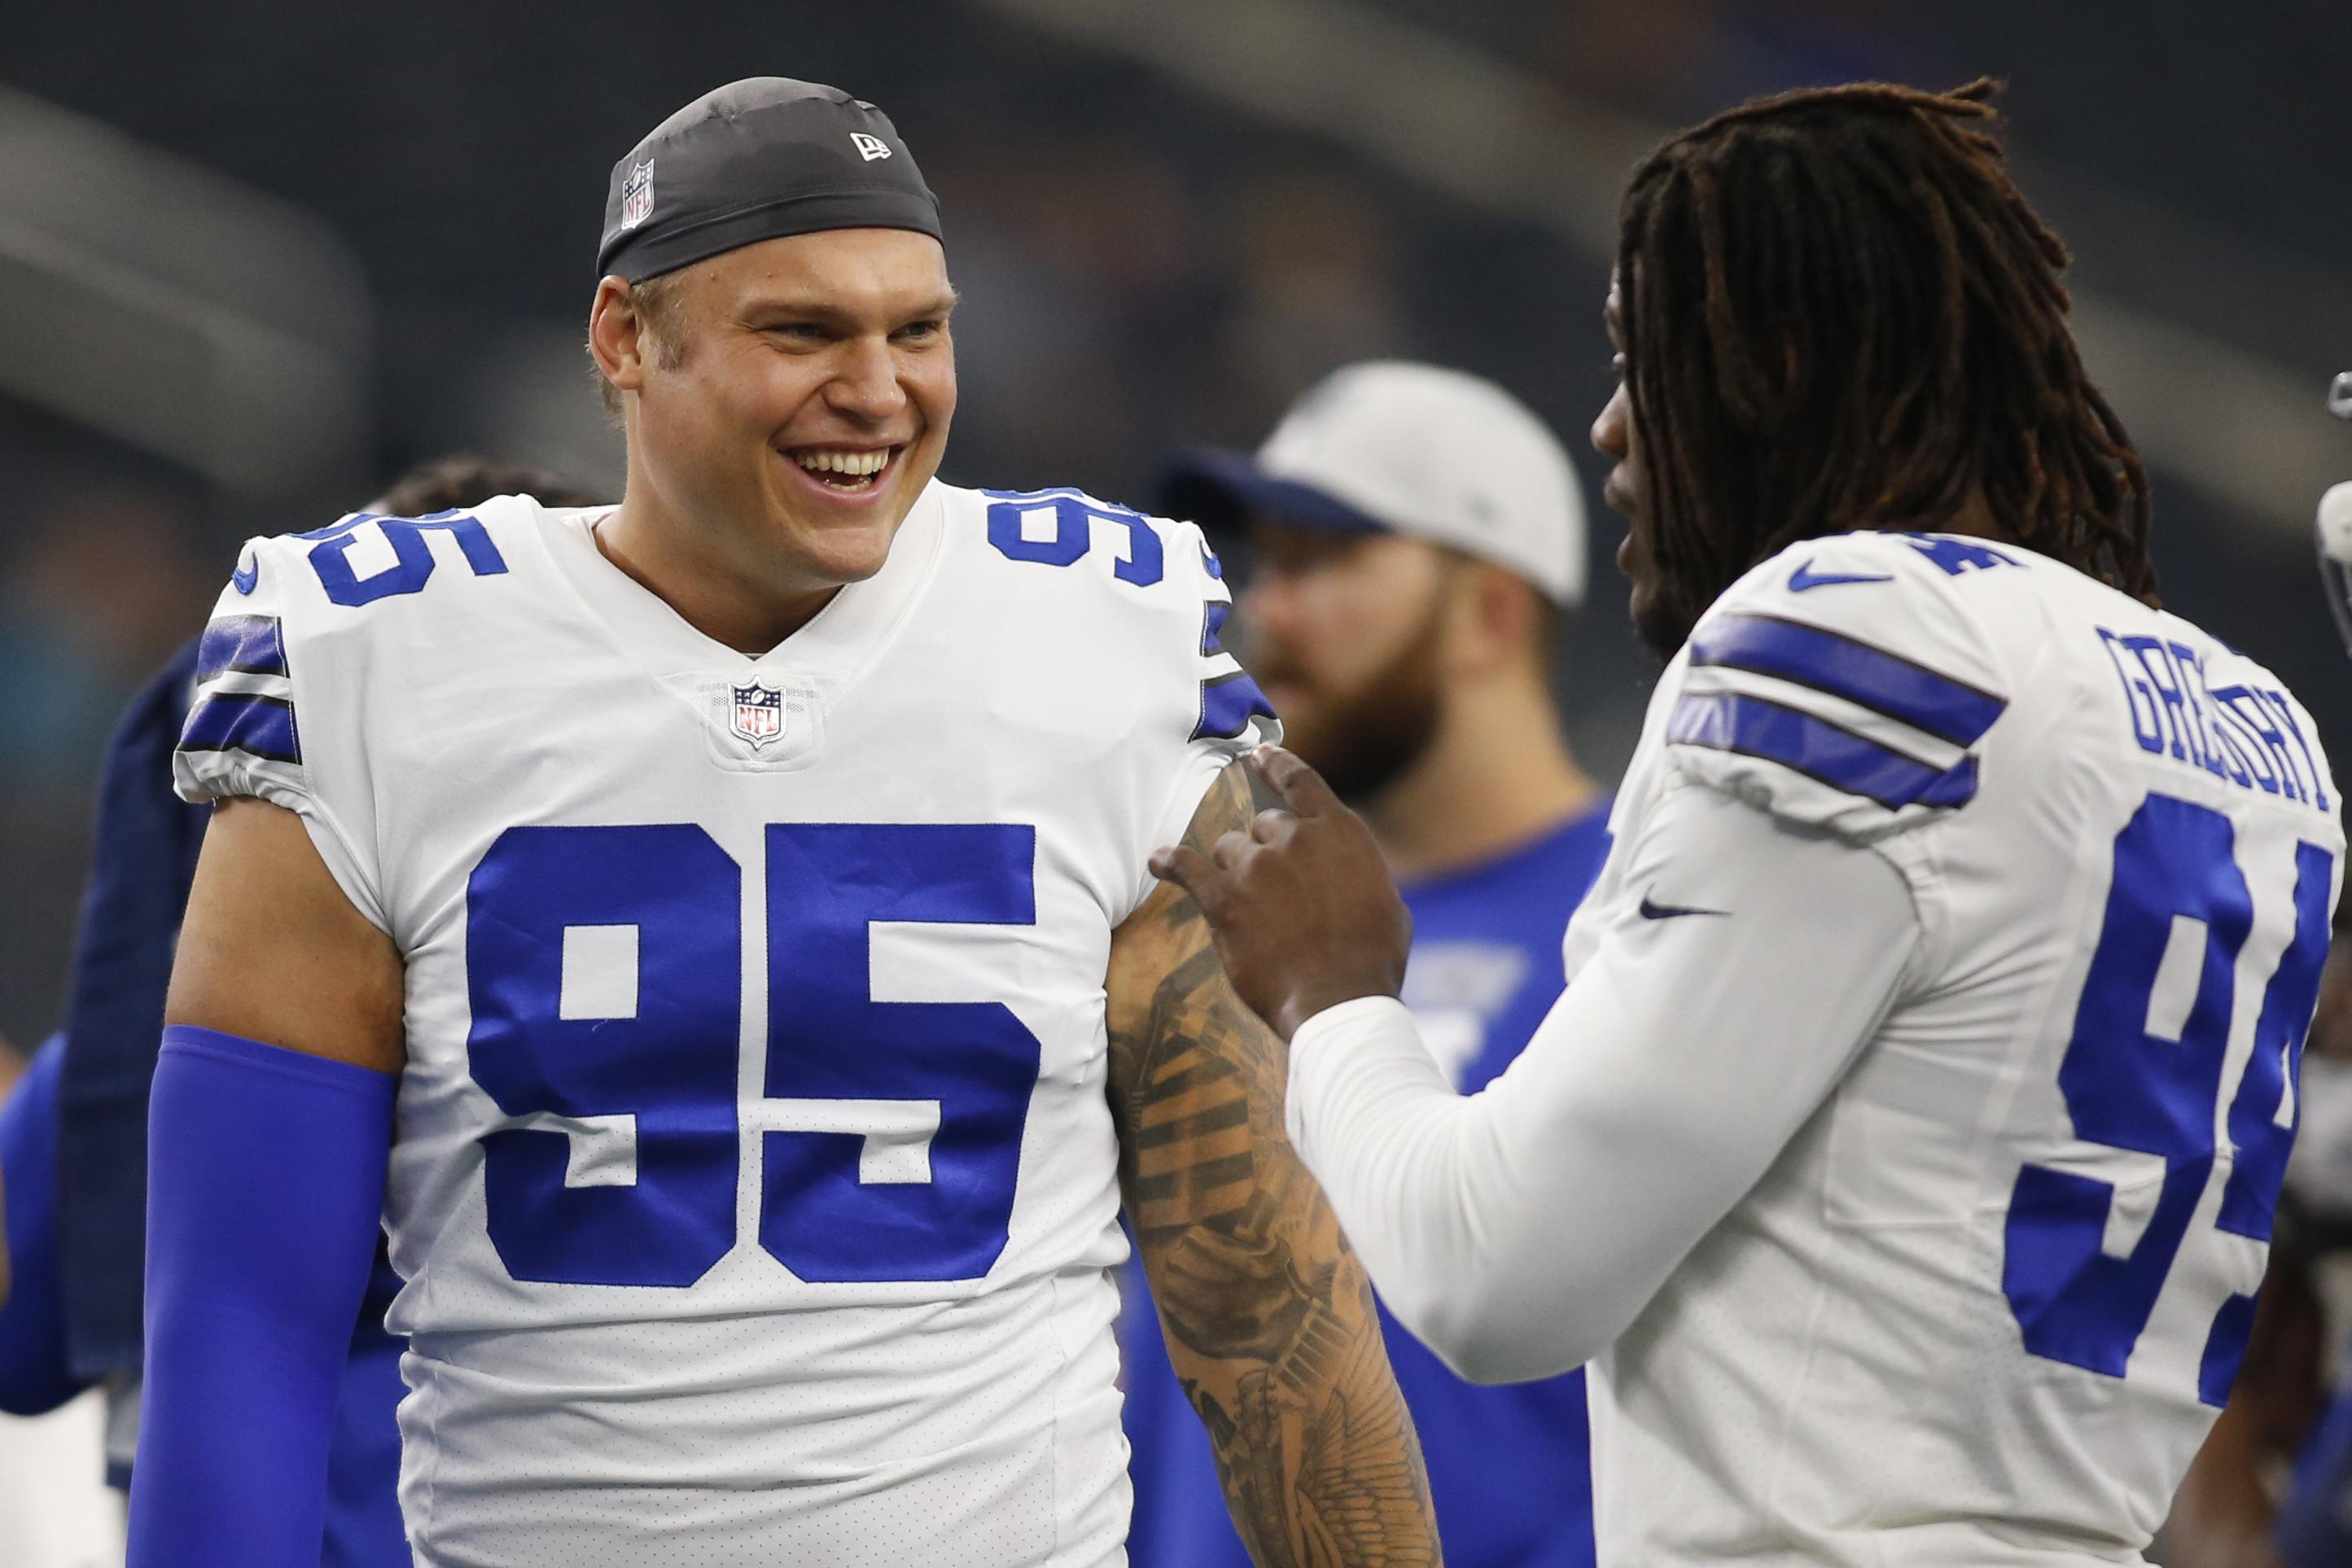 NFL: Jacksonville Jaguars at Dallas Cowboys